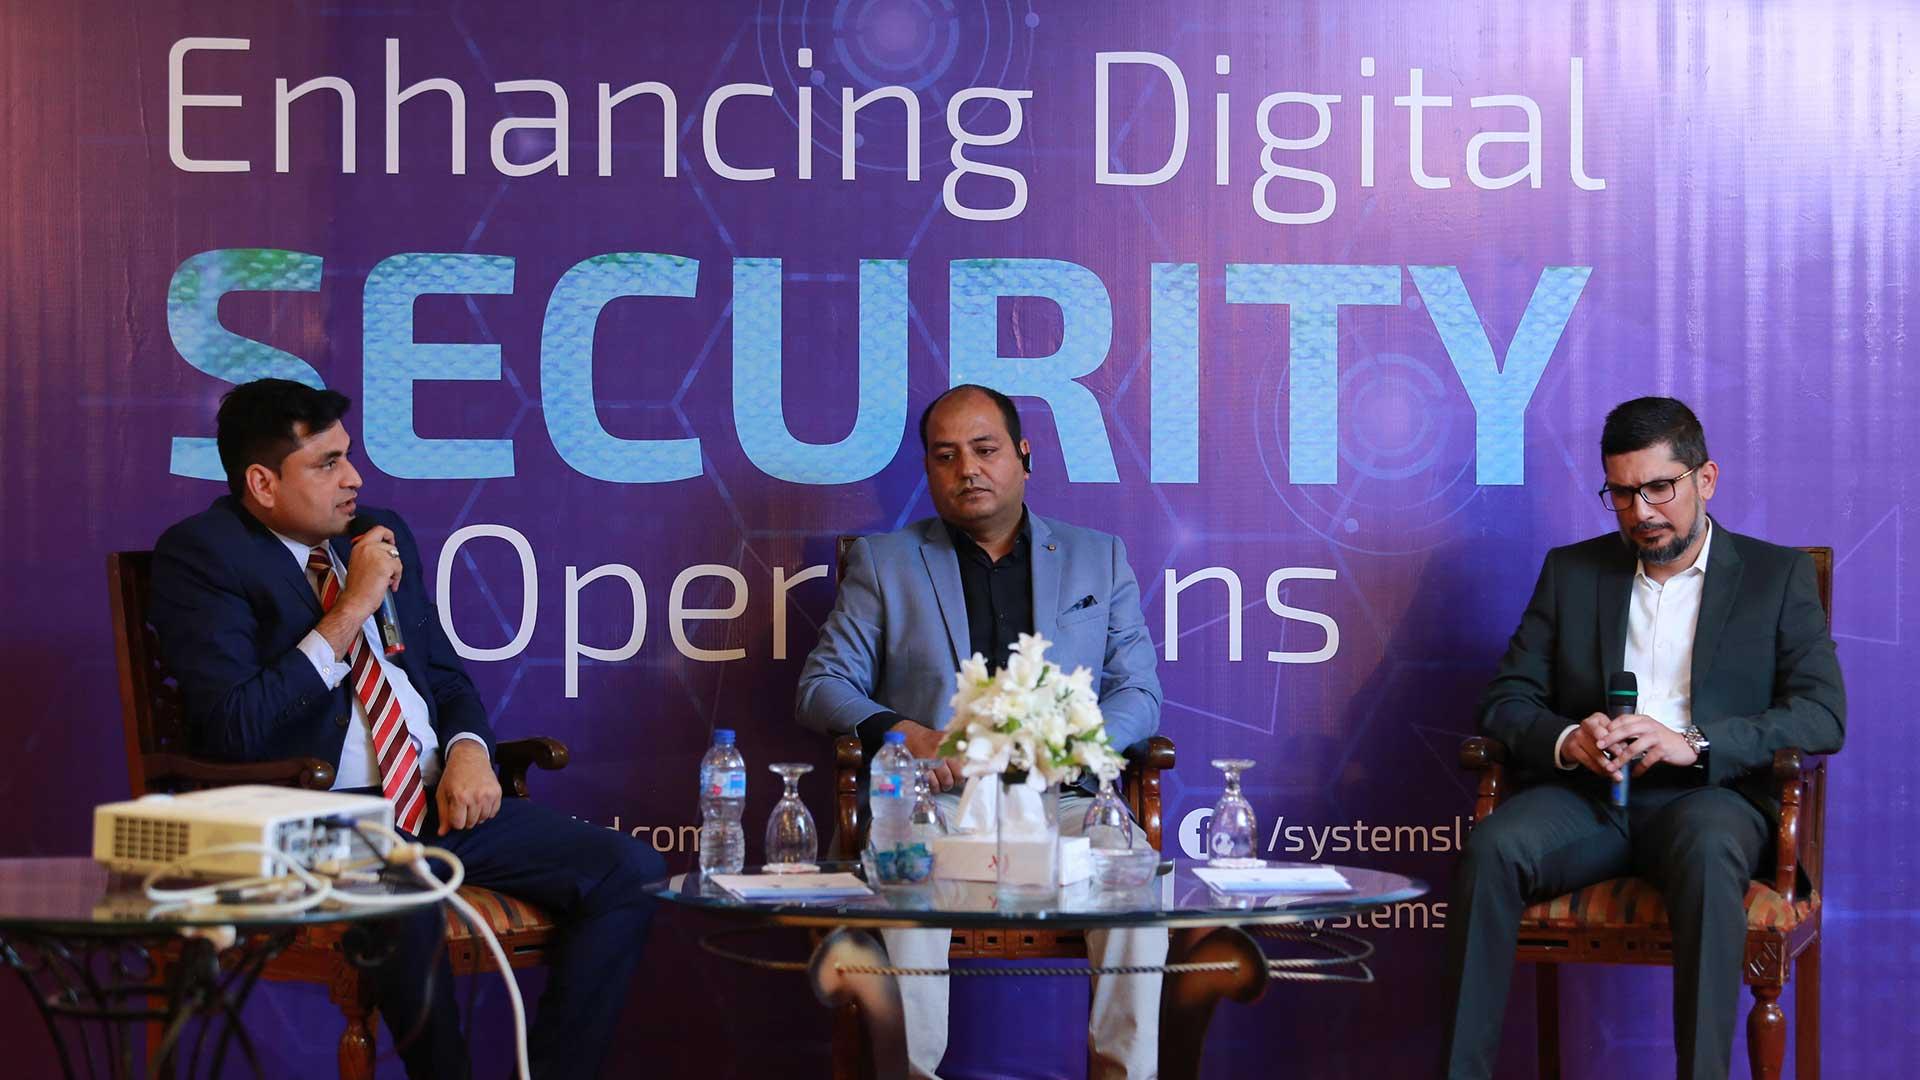 enhancing digital security operations img